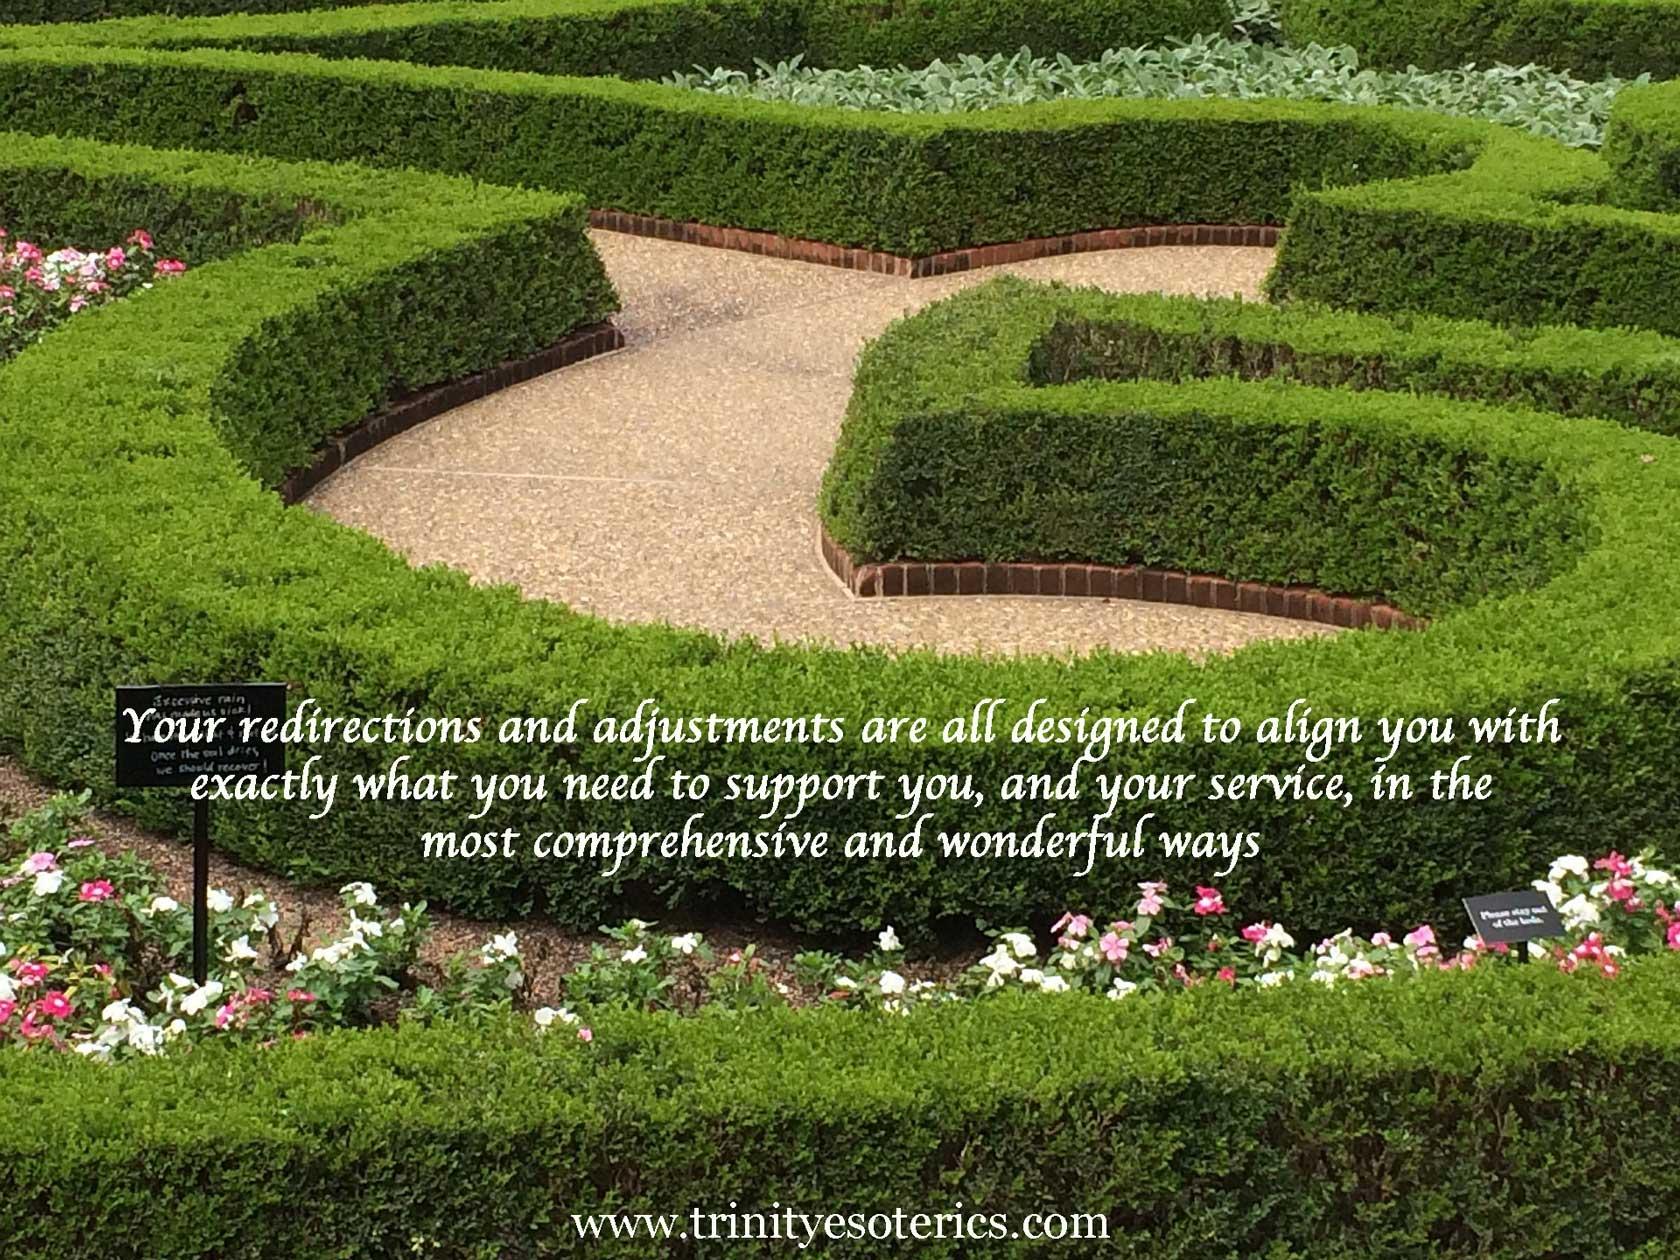 garden maze trinity esoterics